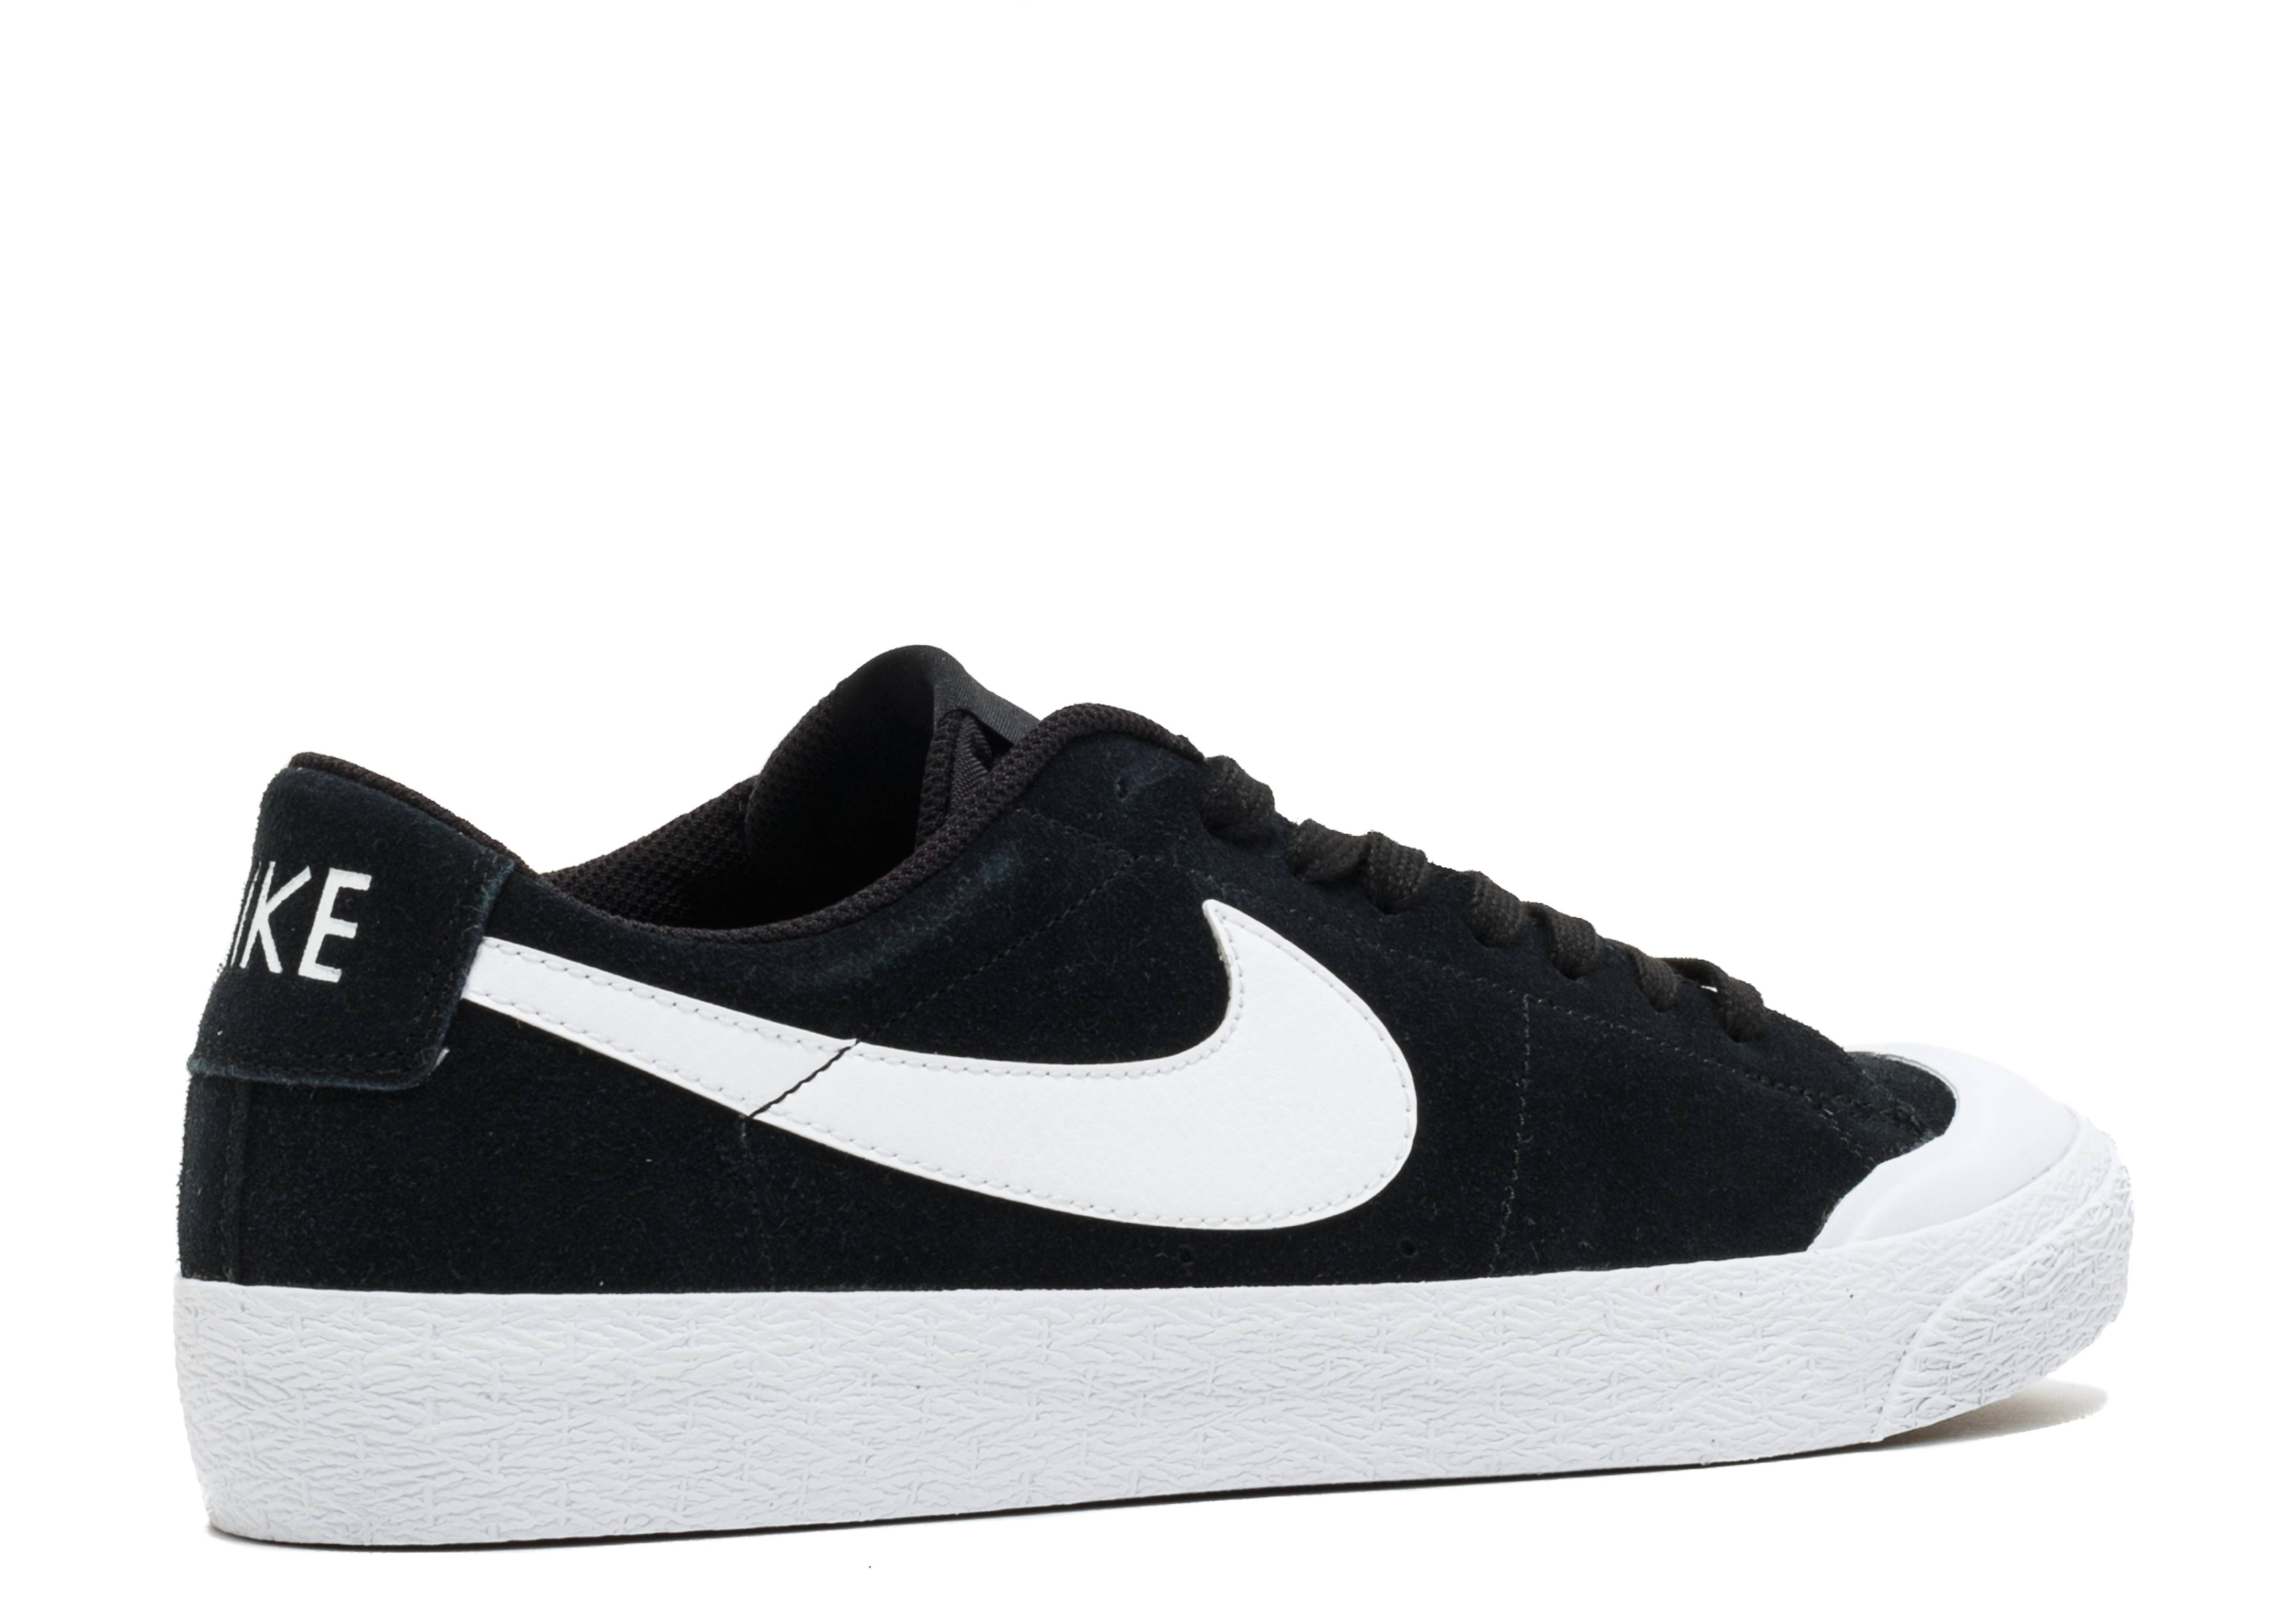 Zoom Blazer Low SB XT 'Black' - Nike - 864348 019 - black/white ...